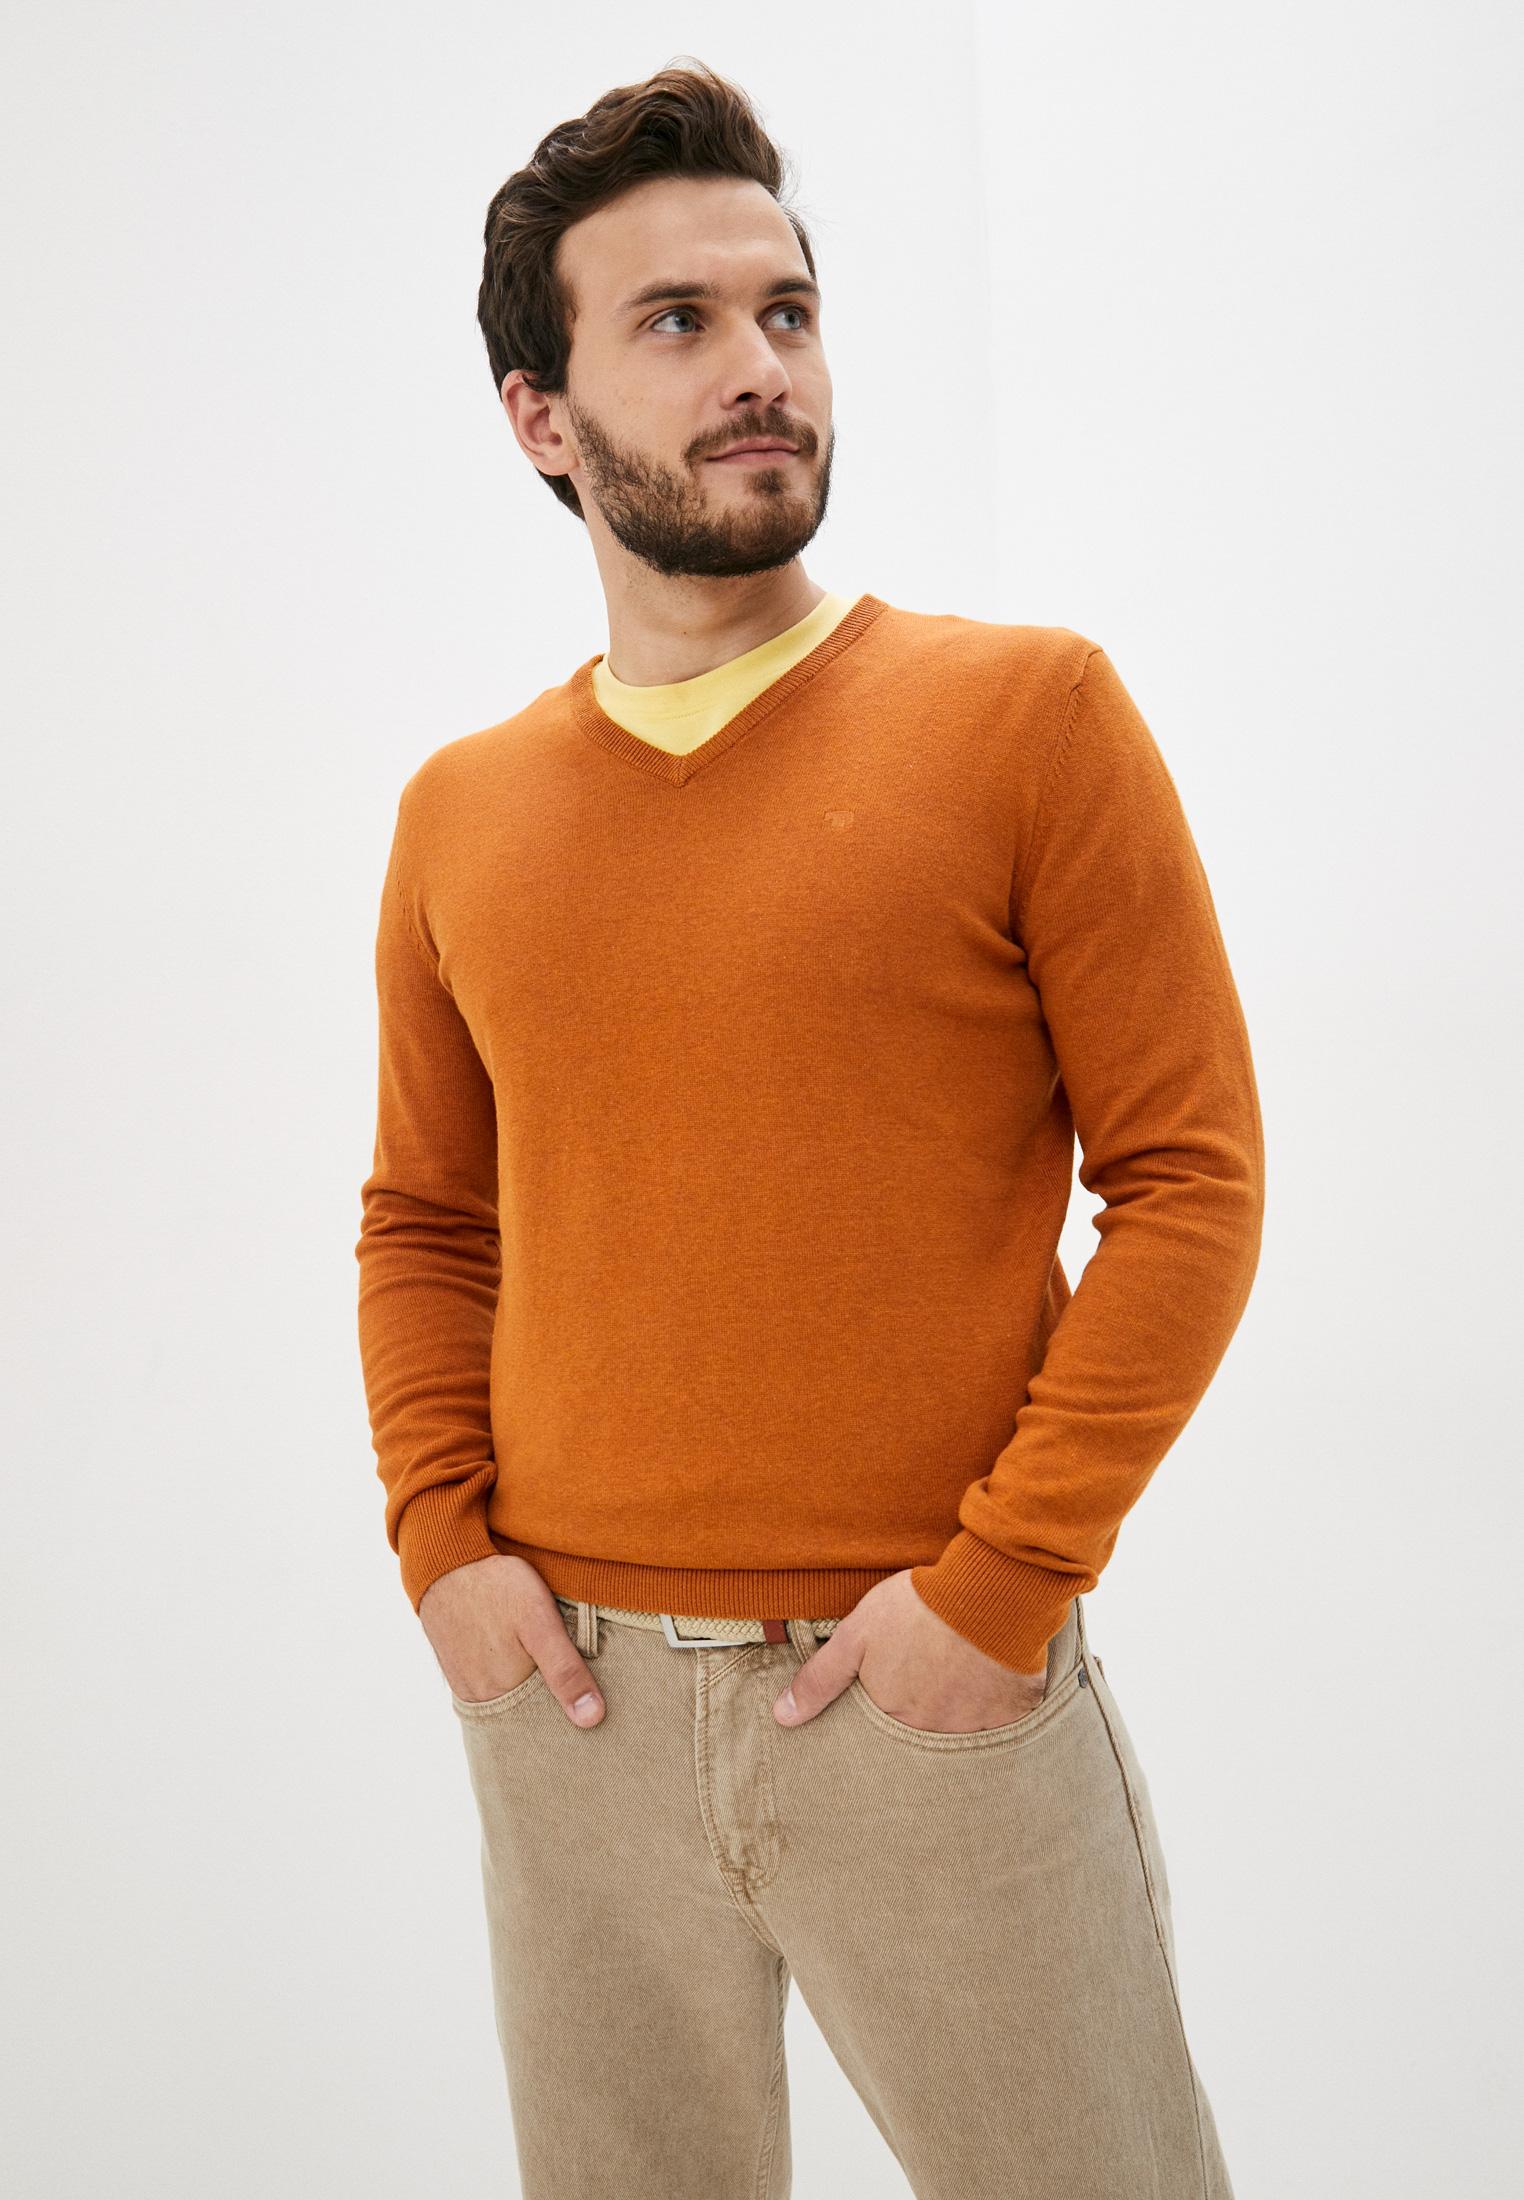 Пуловер Tom Tailor (Том Тейлор) Пуловер Tom Tailor